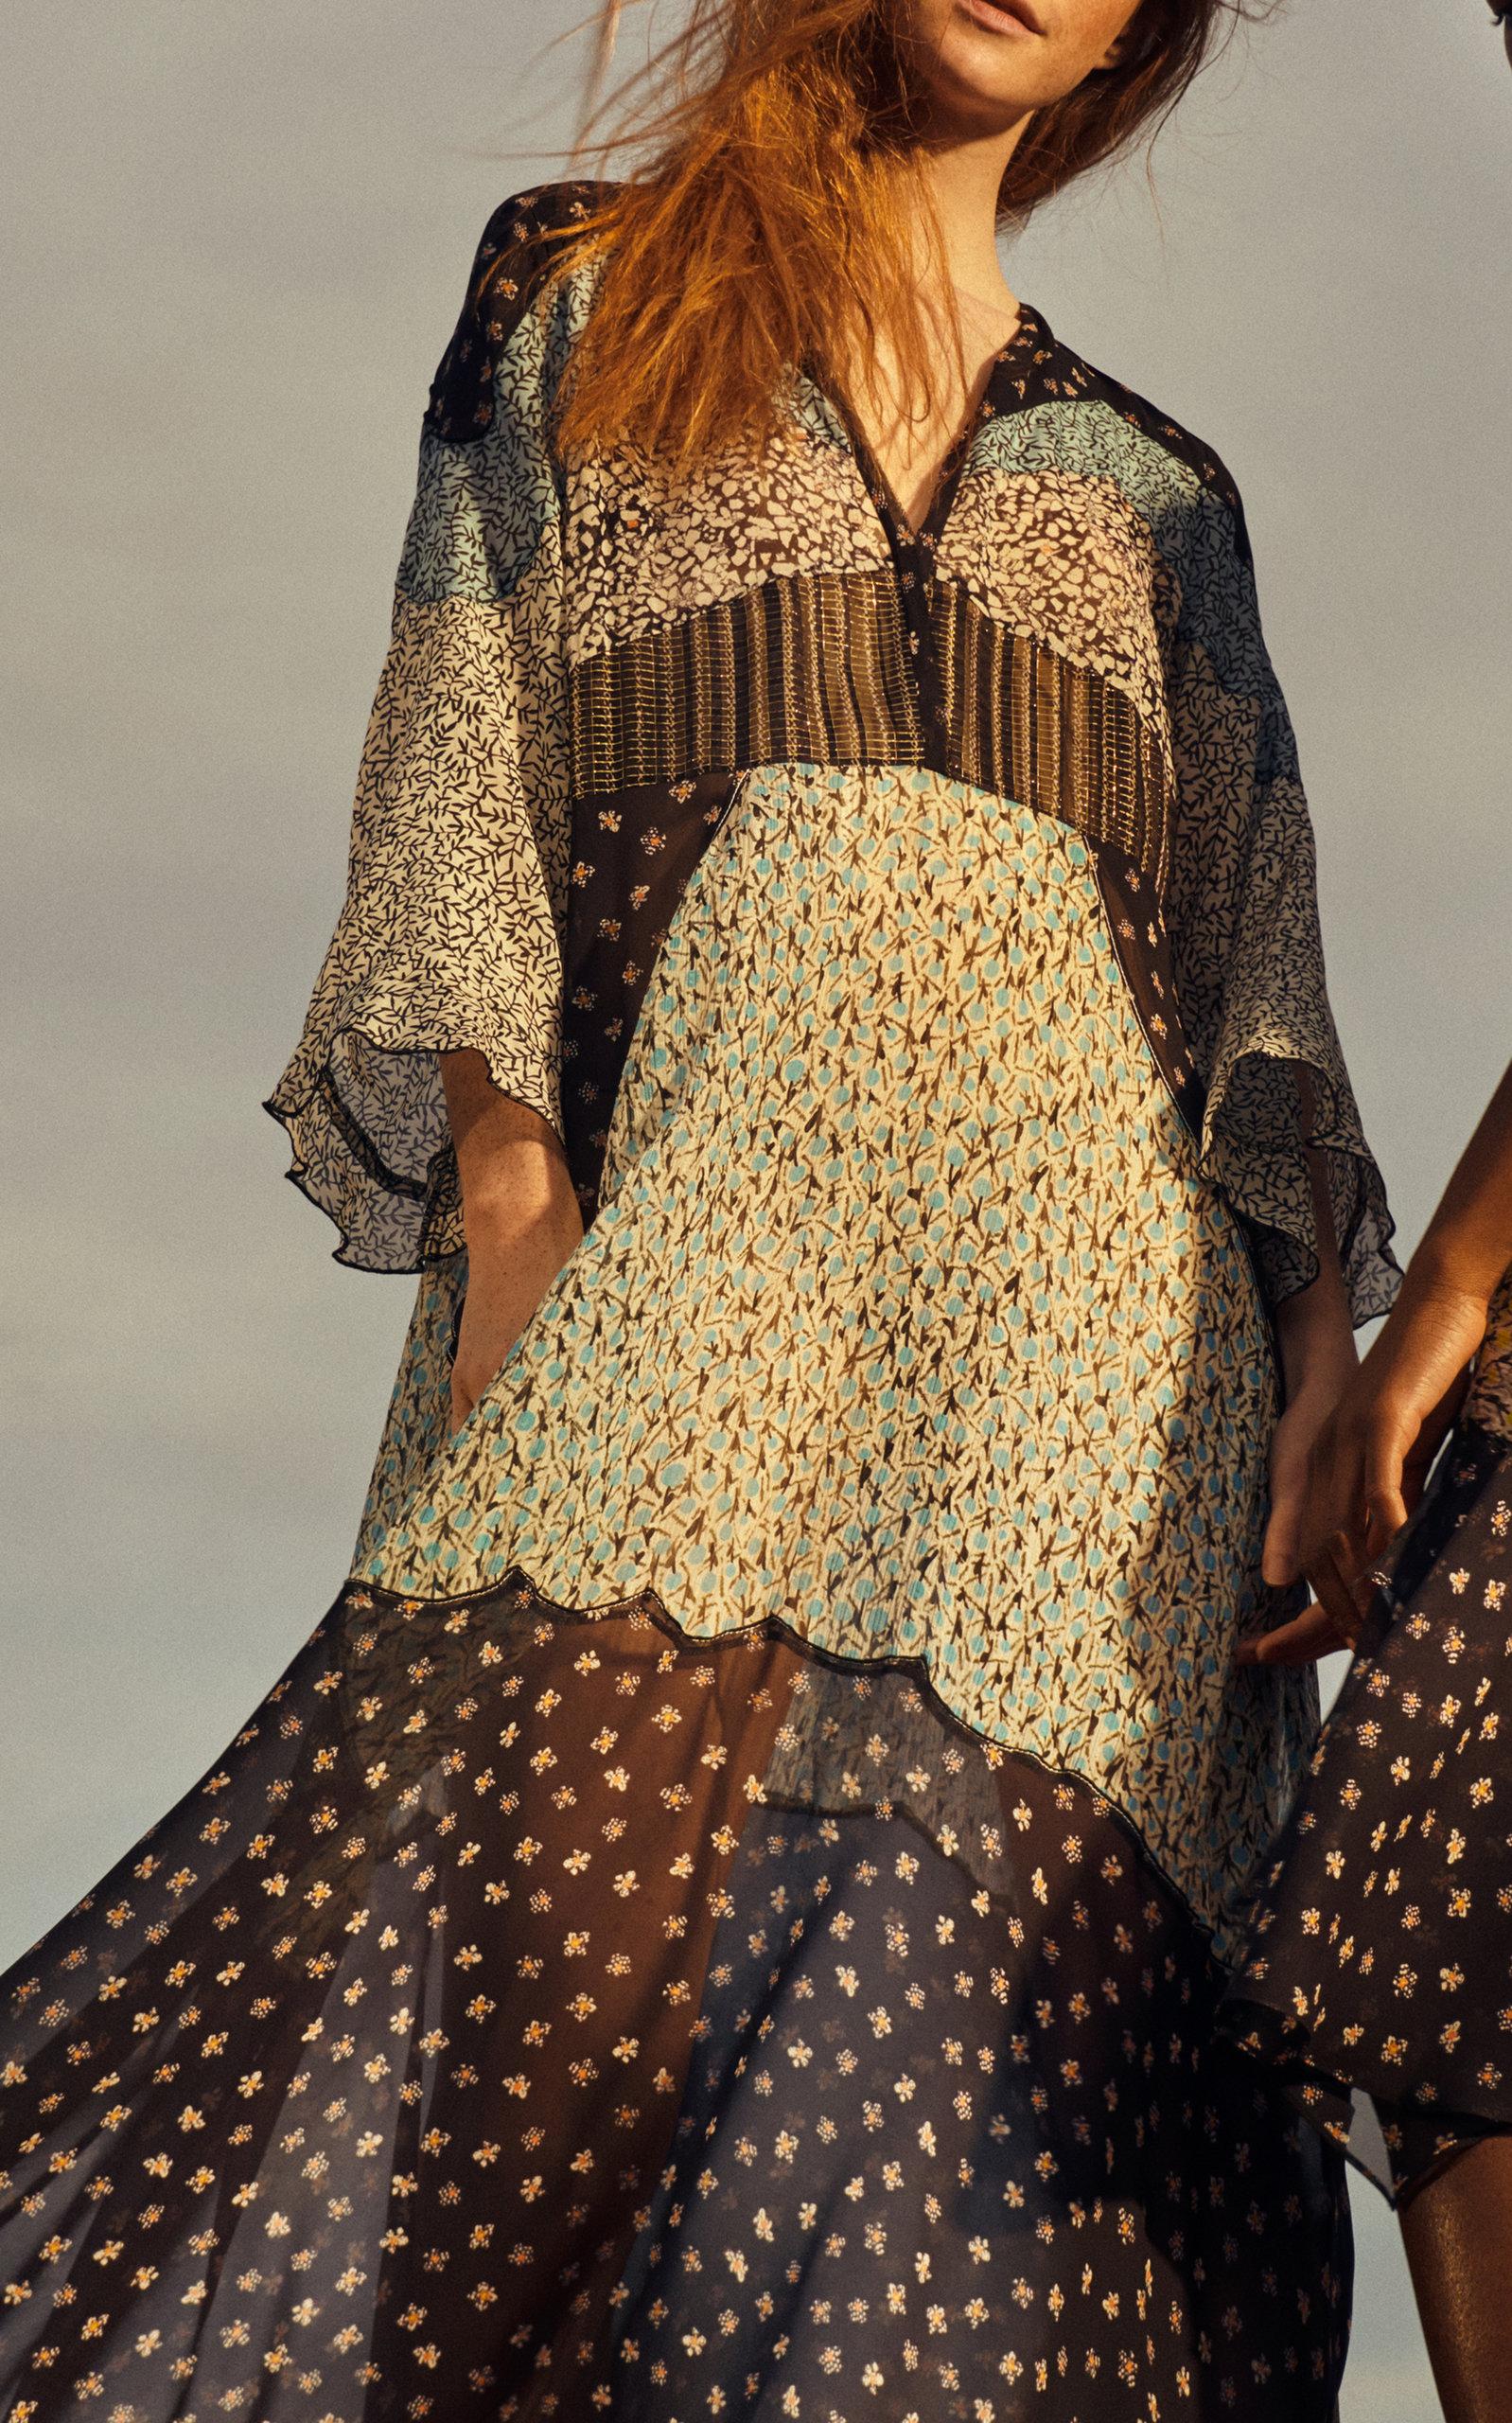 Dress Dorothee Midi Mix Moda Energetic By Printed Operandi zRqFOgBq